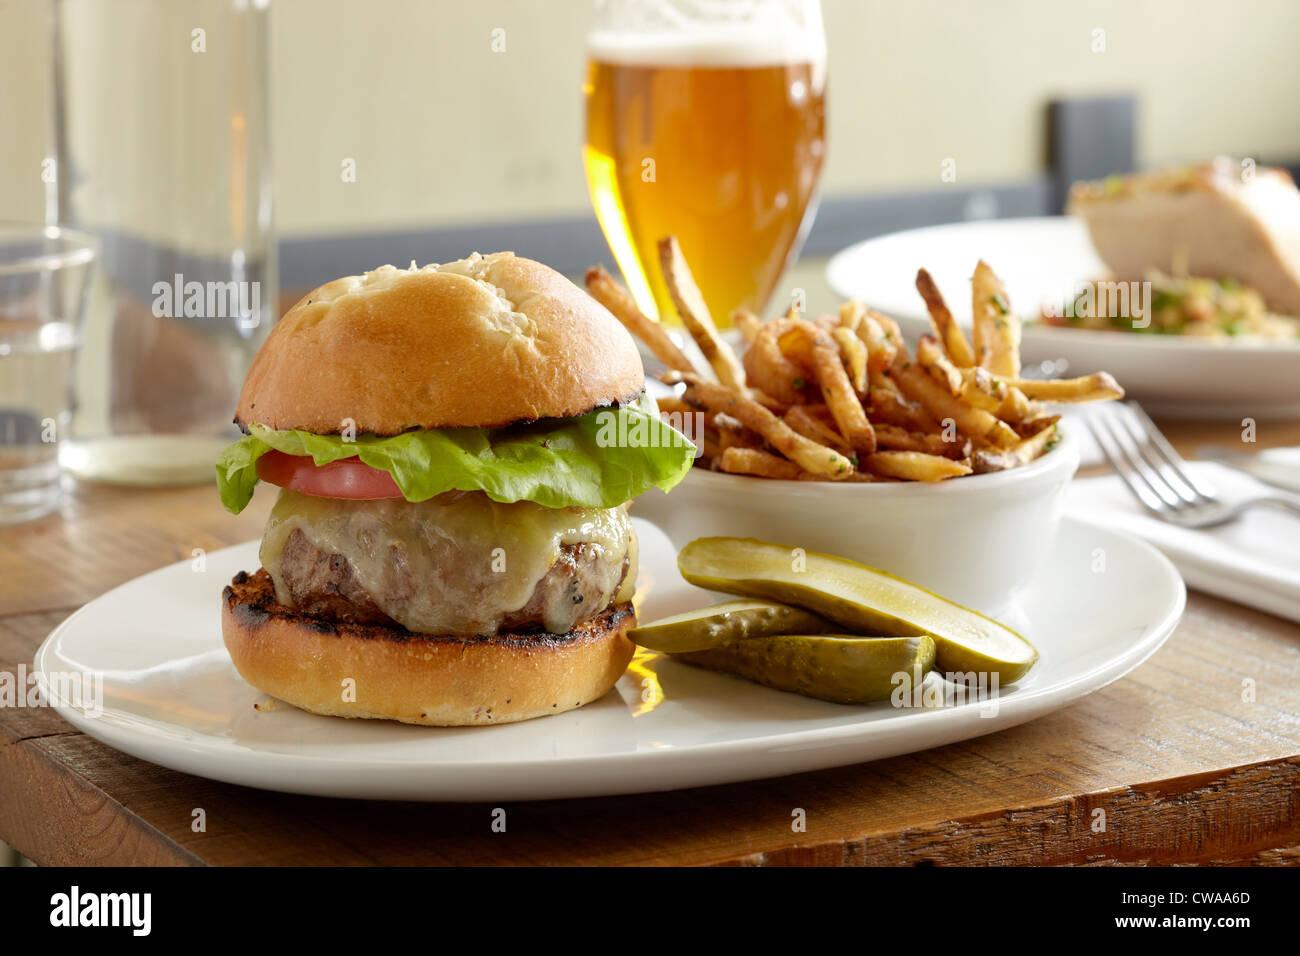 Burger et frites Photo Stock